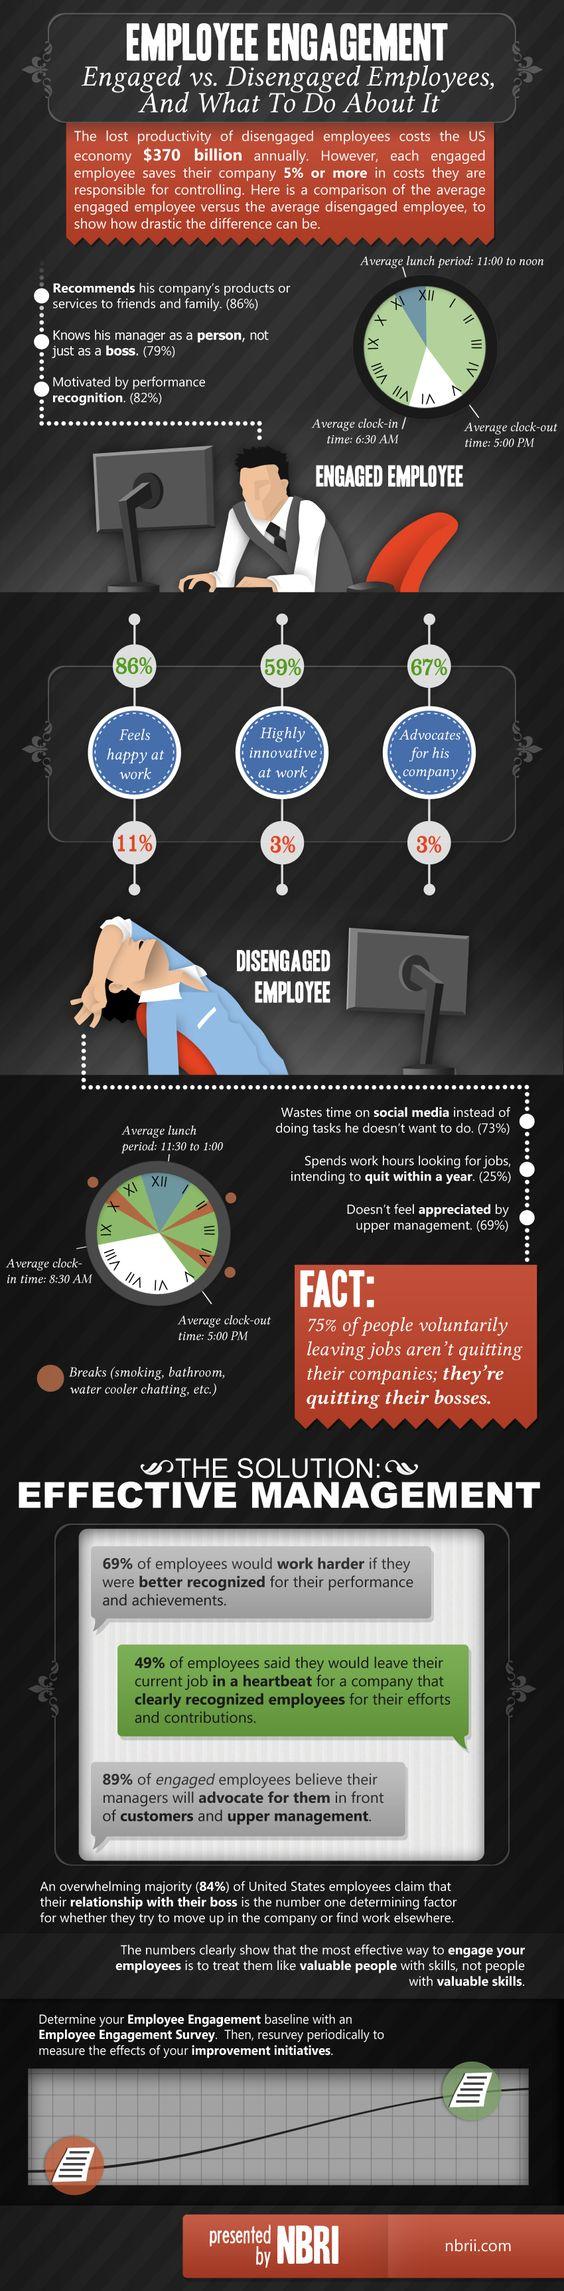 #Employee #Engagement (#Infographic h/t @SchillingThomas)